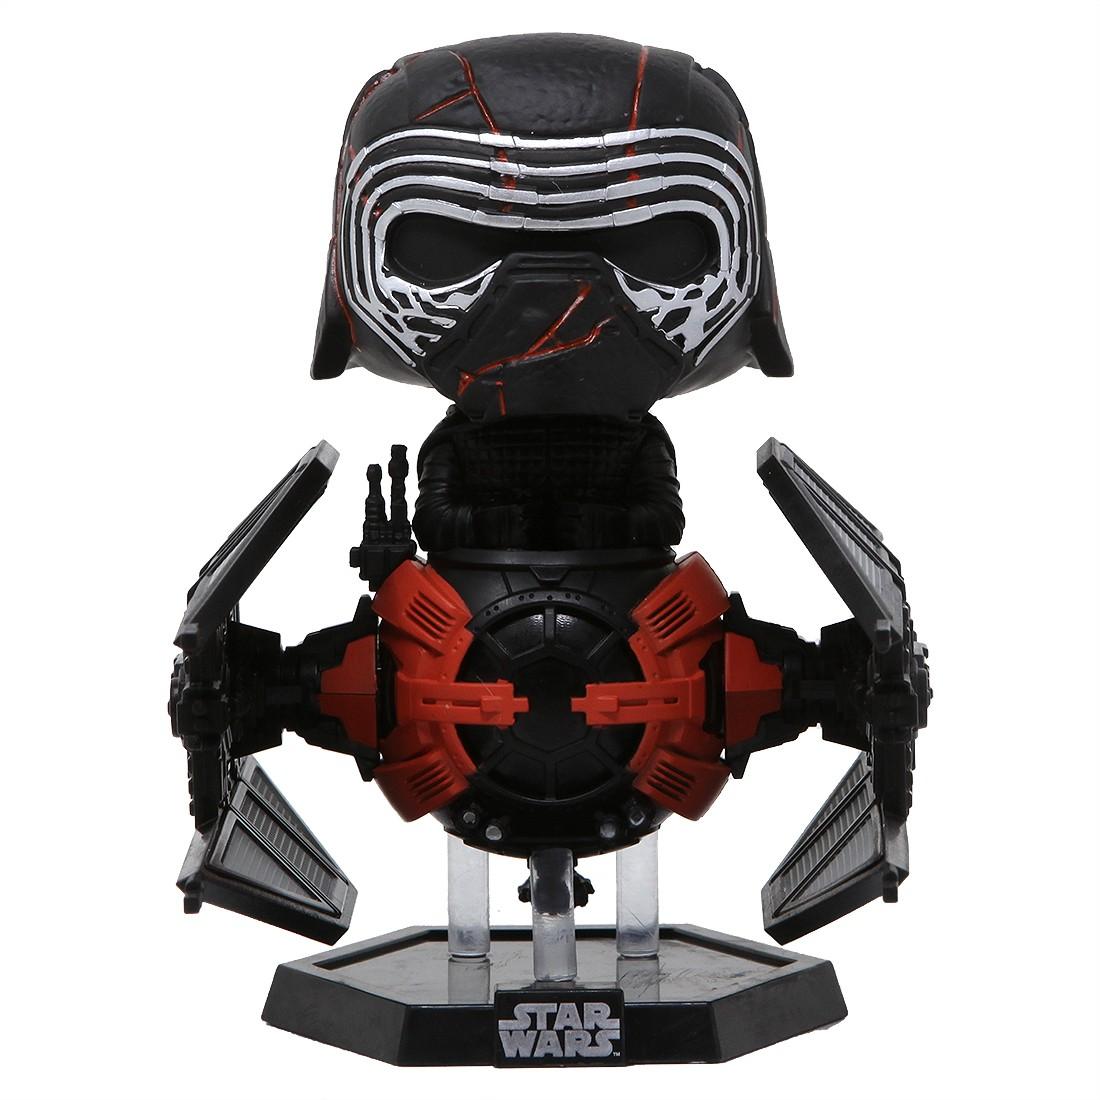 Funko Pop Deluxe Star Wars The Rise Of Skywalker Supreme Leader Kylo Ren In The Whisper Black